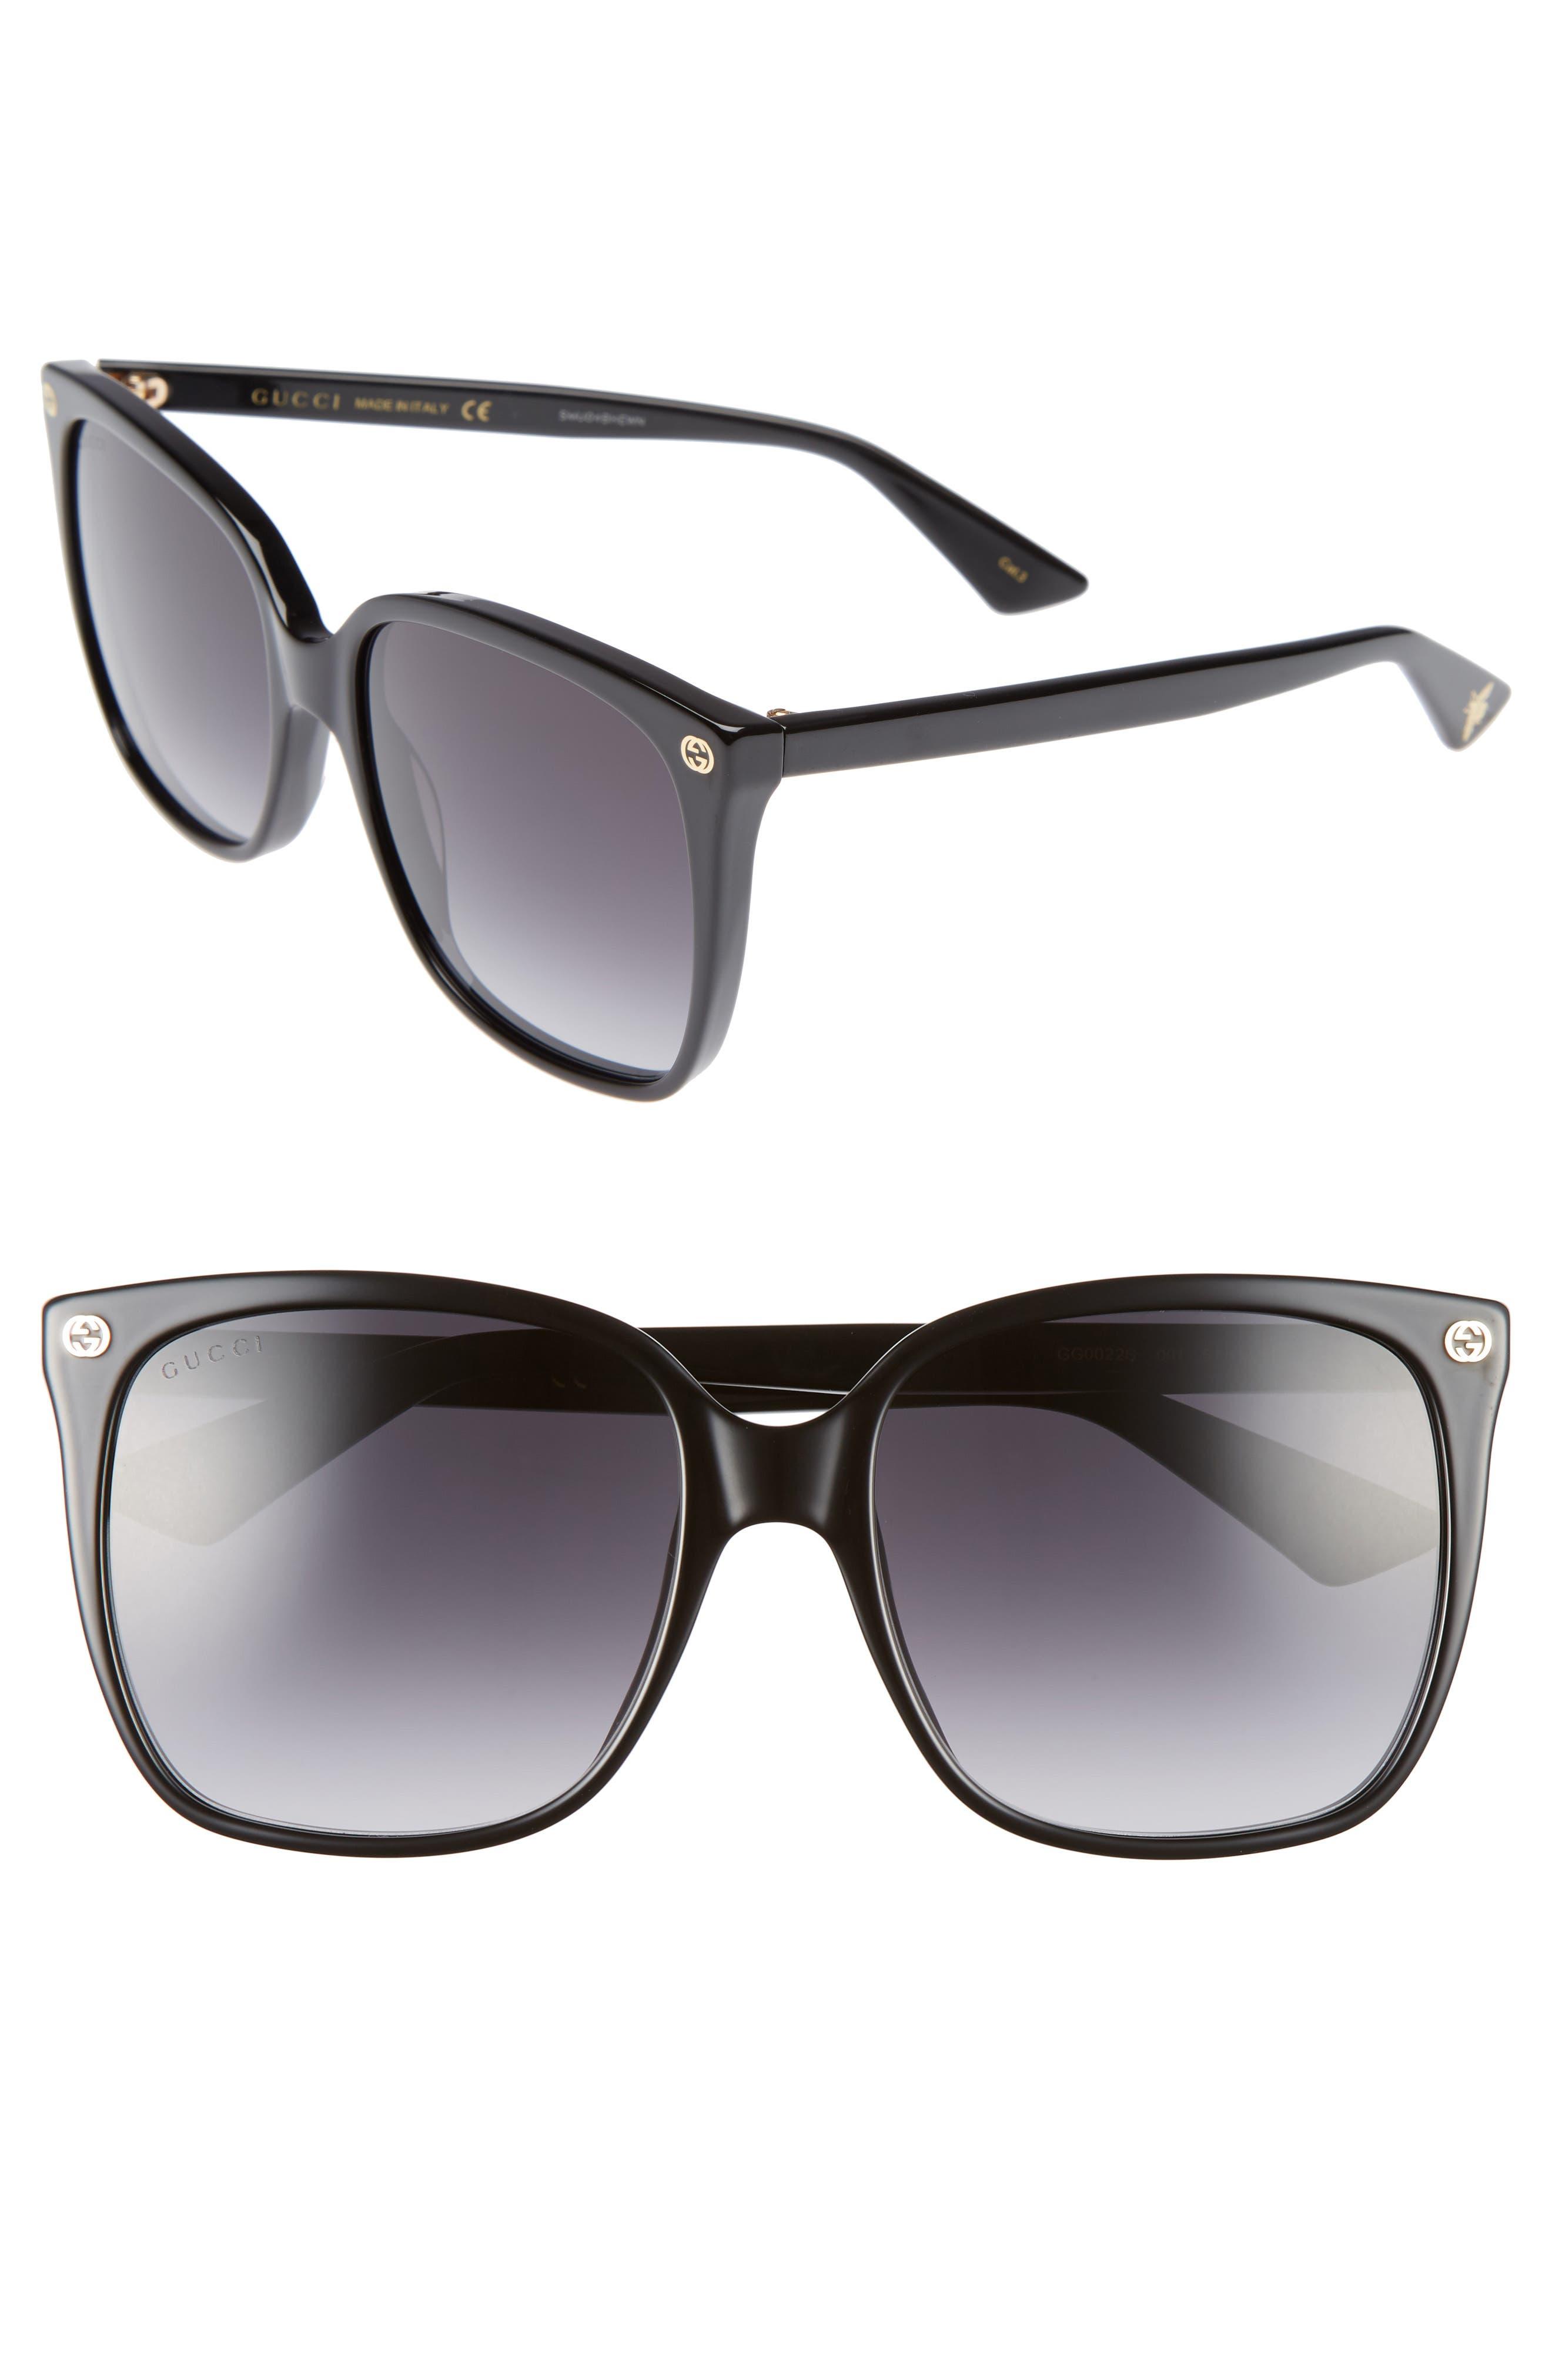 GUCCI, 57mm Square Sunglasses, Main thumbnail 1, color, BLACK/ GREY